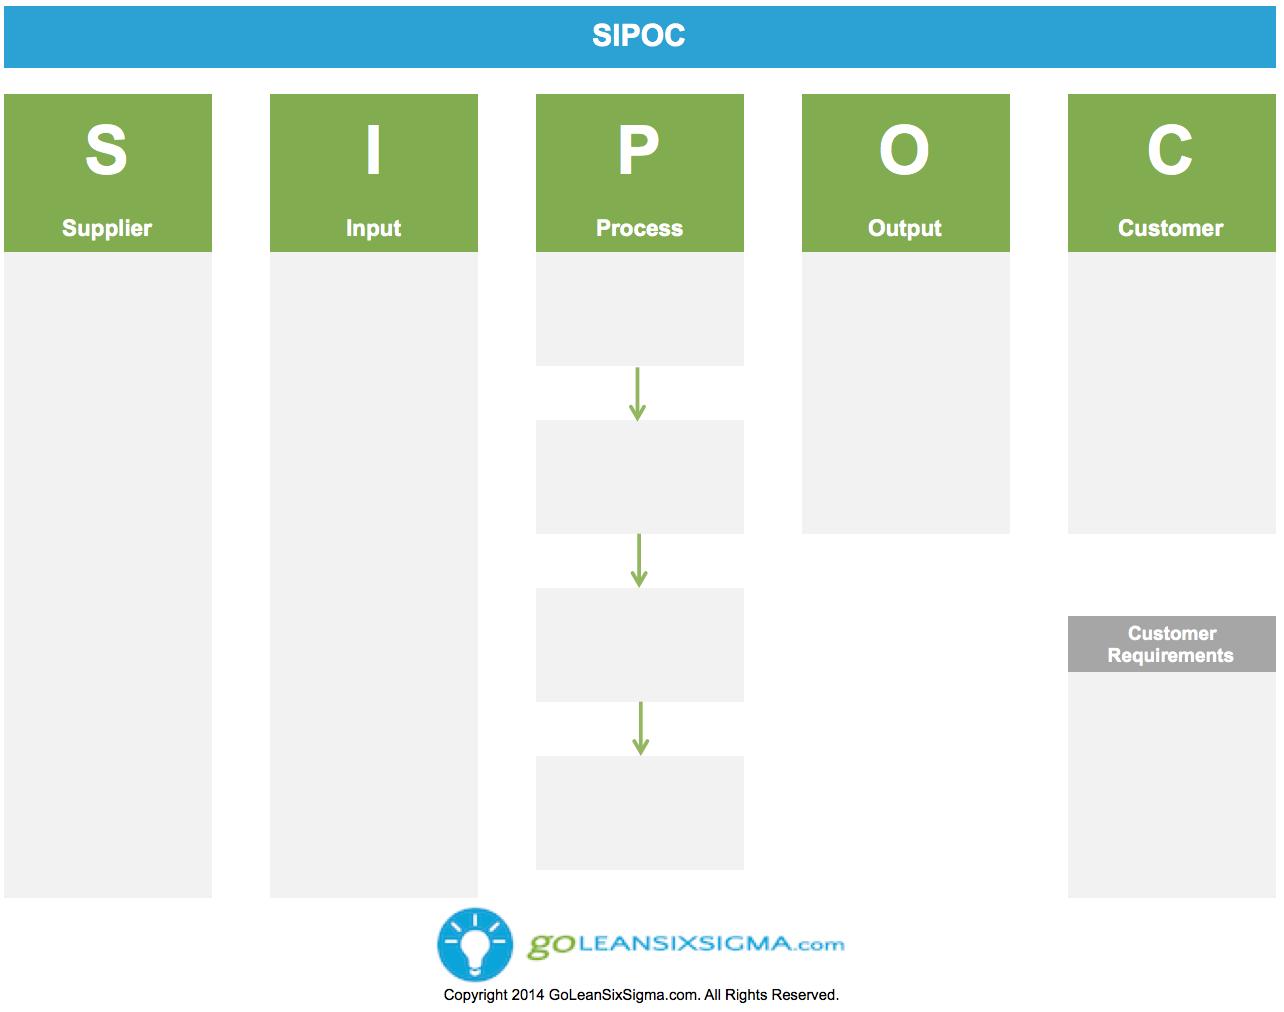 SIPOC – GoLeanSixSigma.com